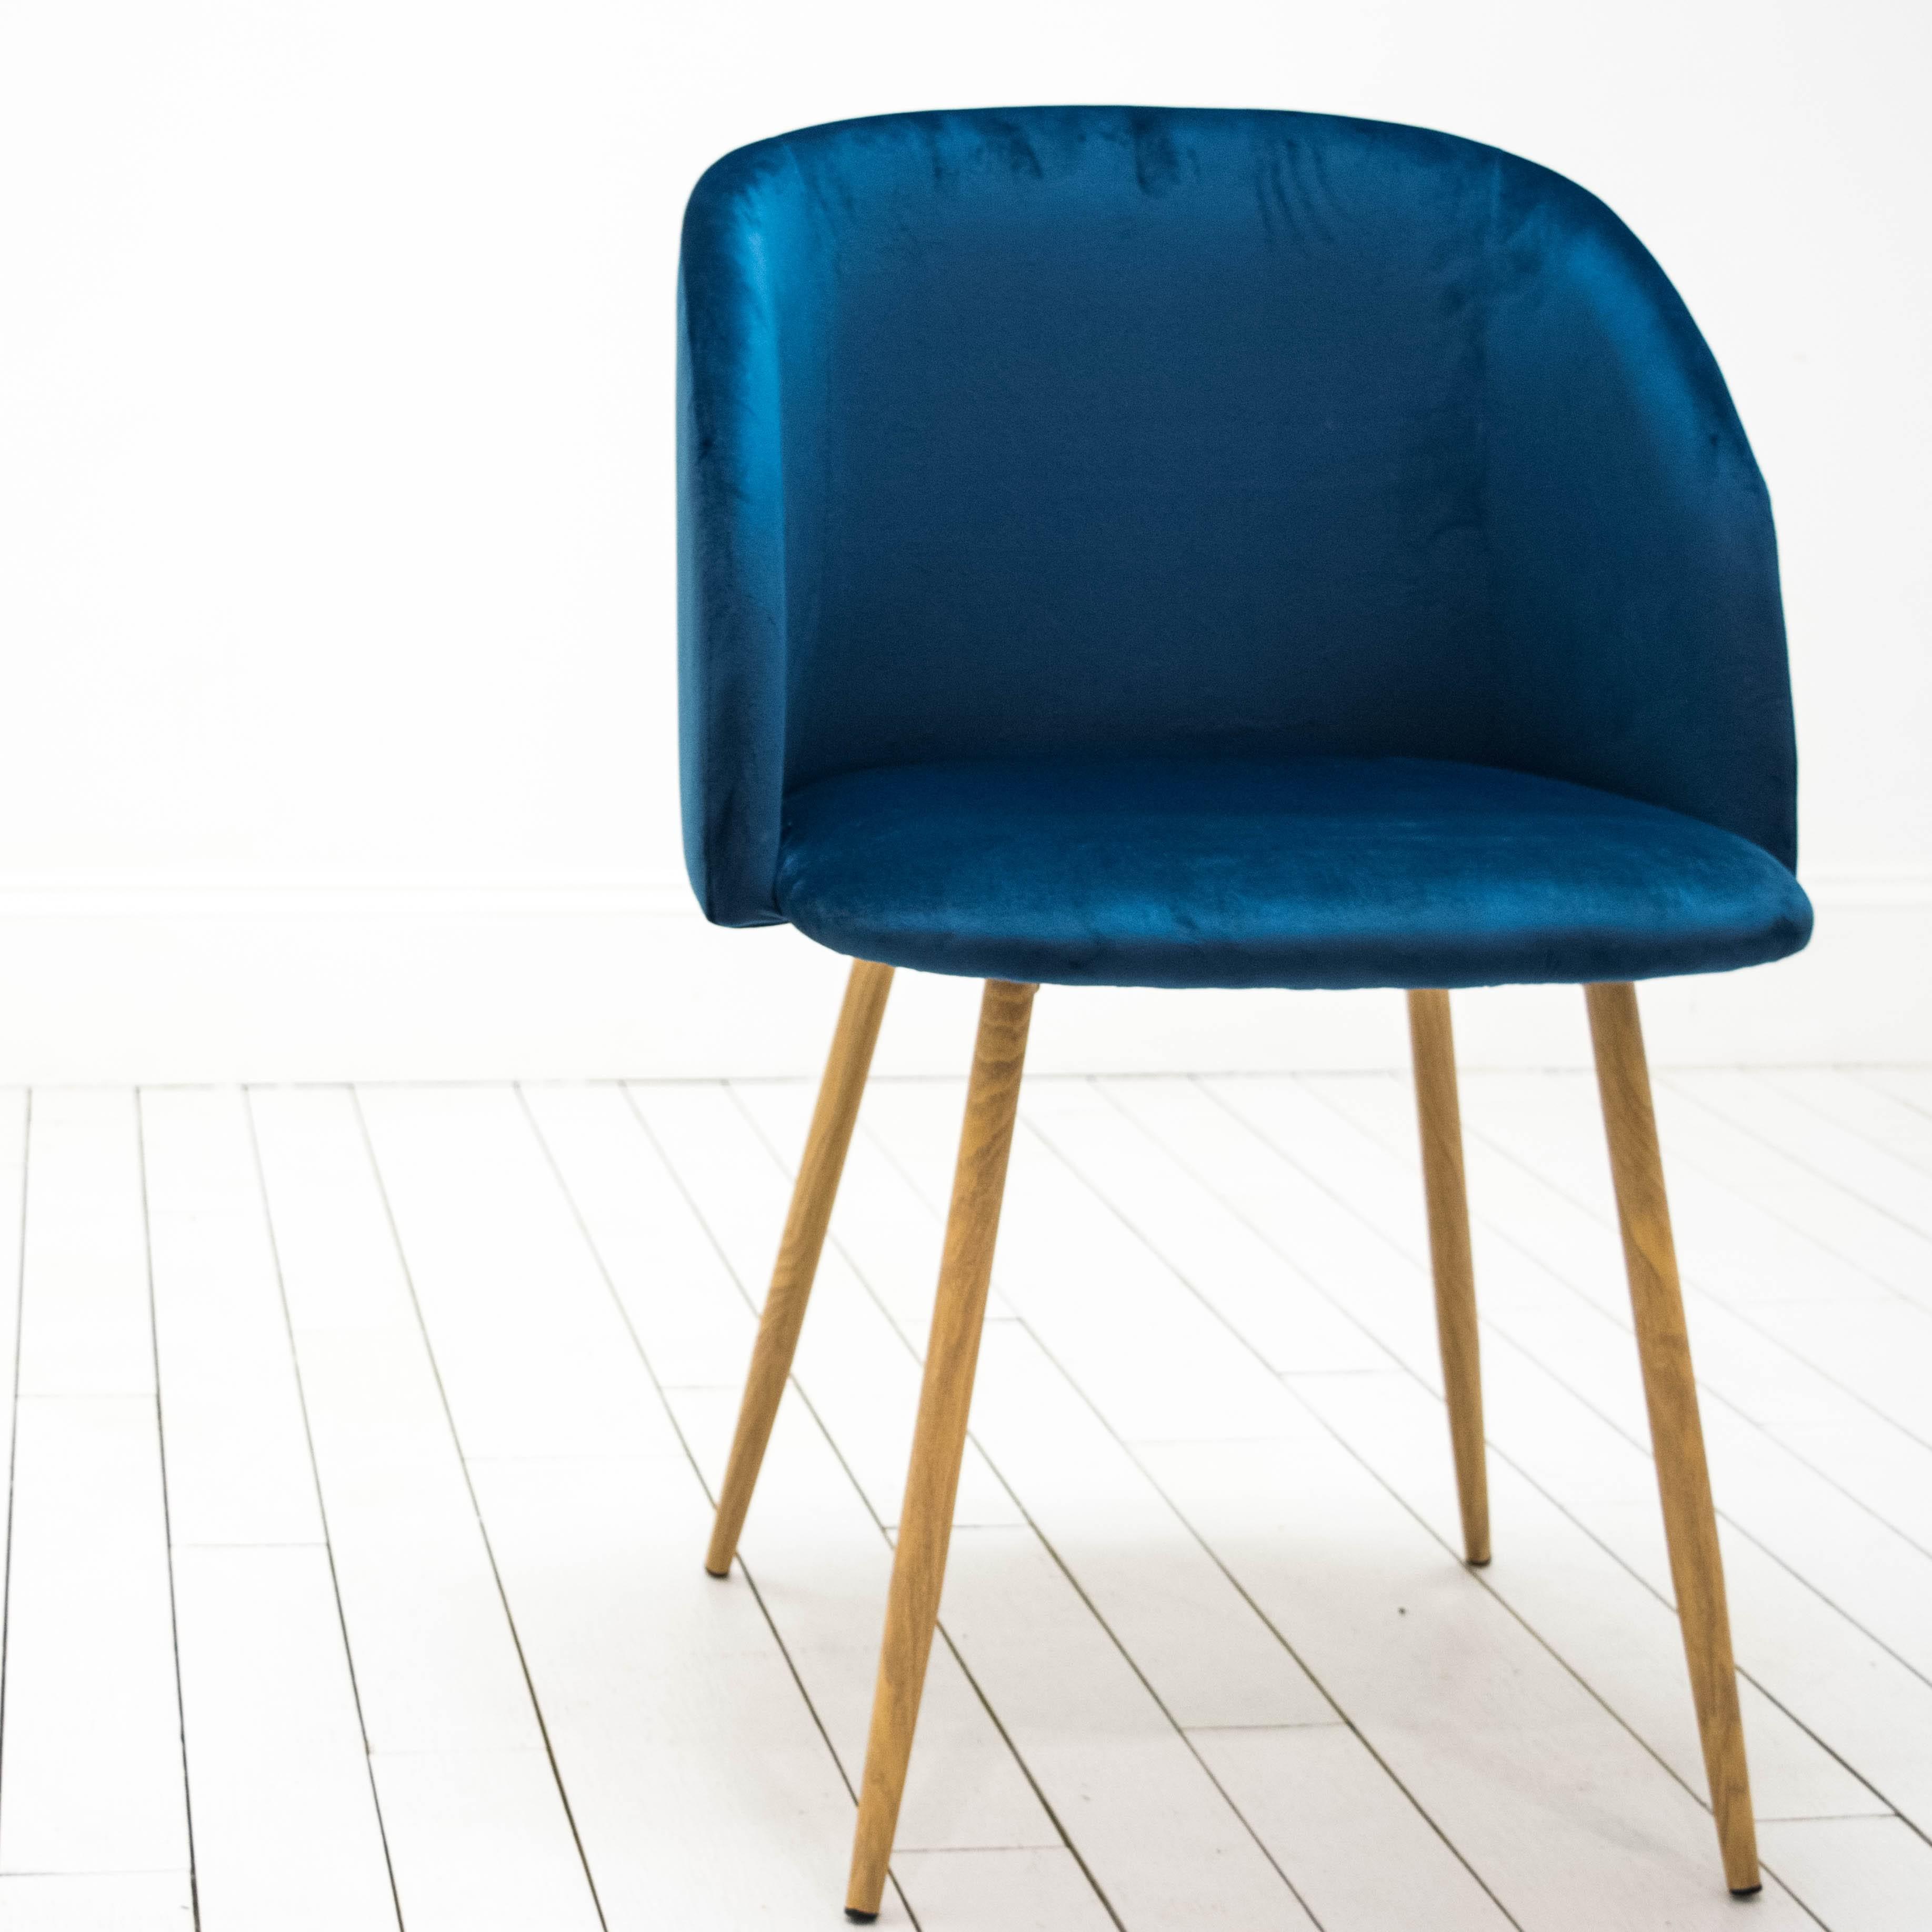 Wyatt Chairs - Blue